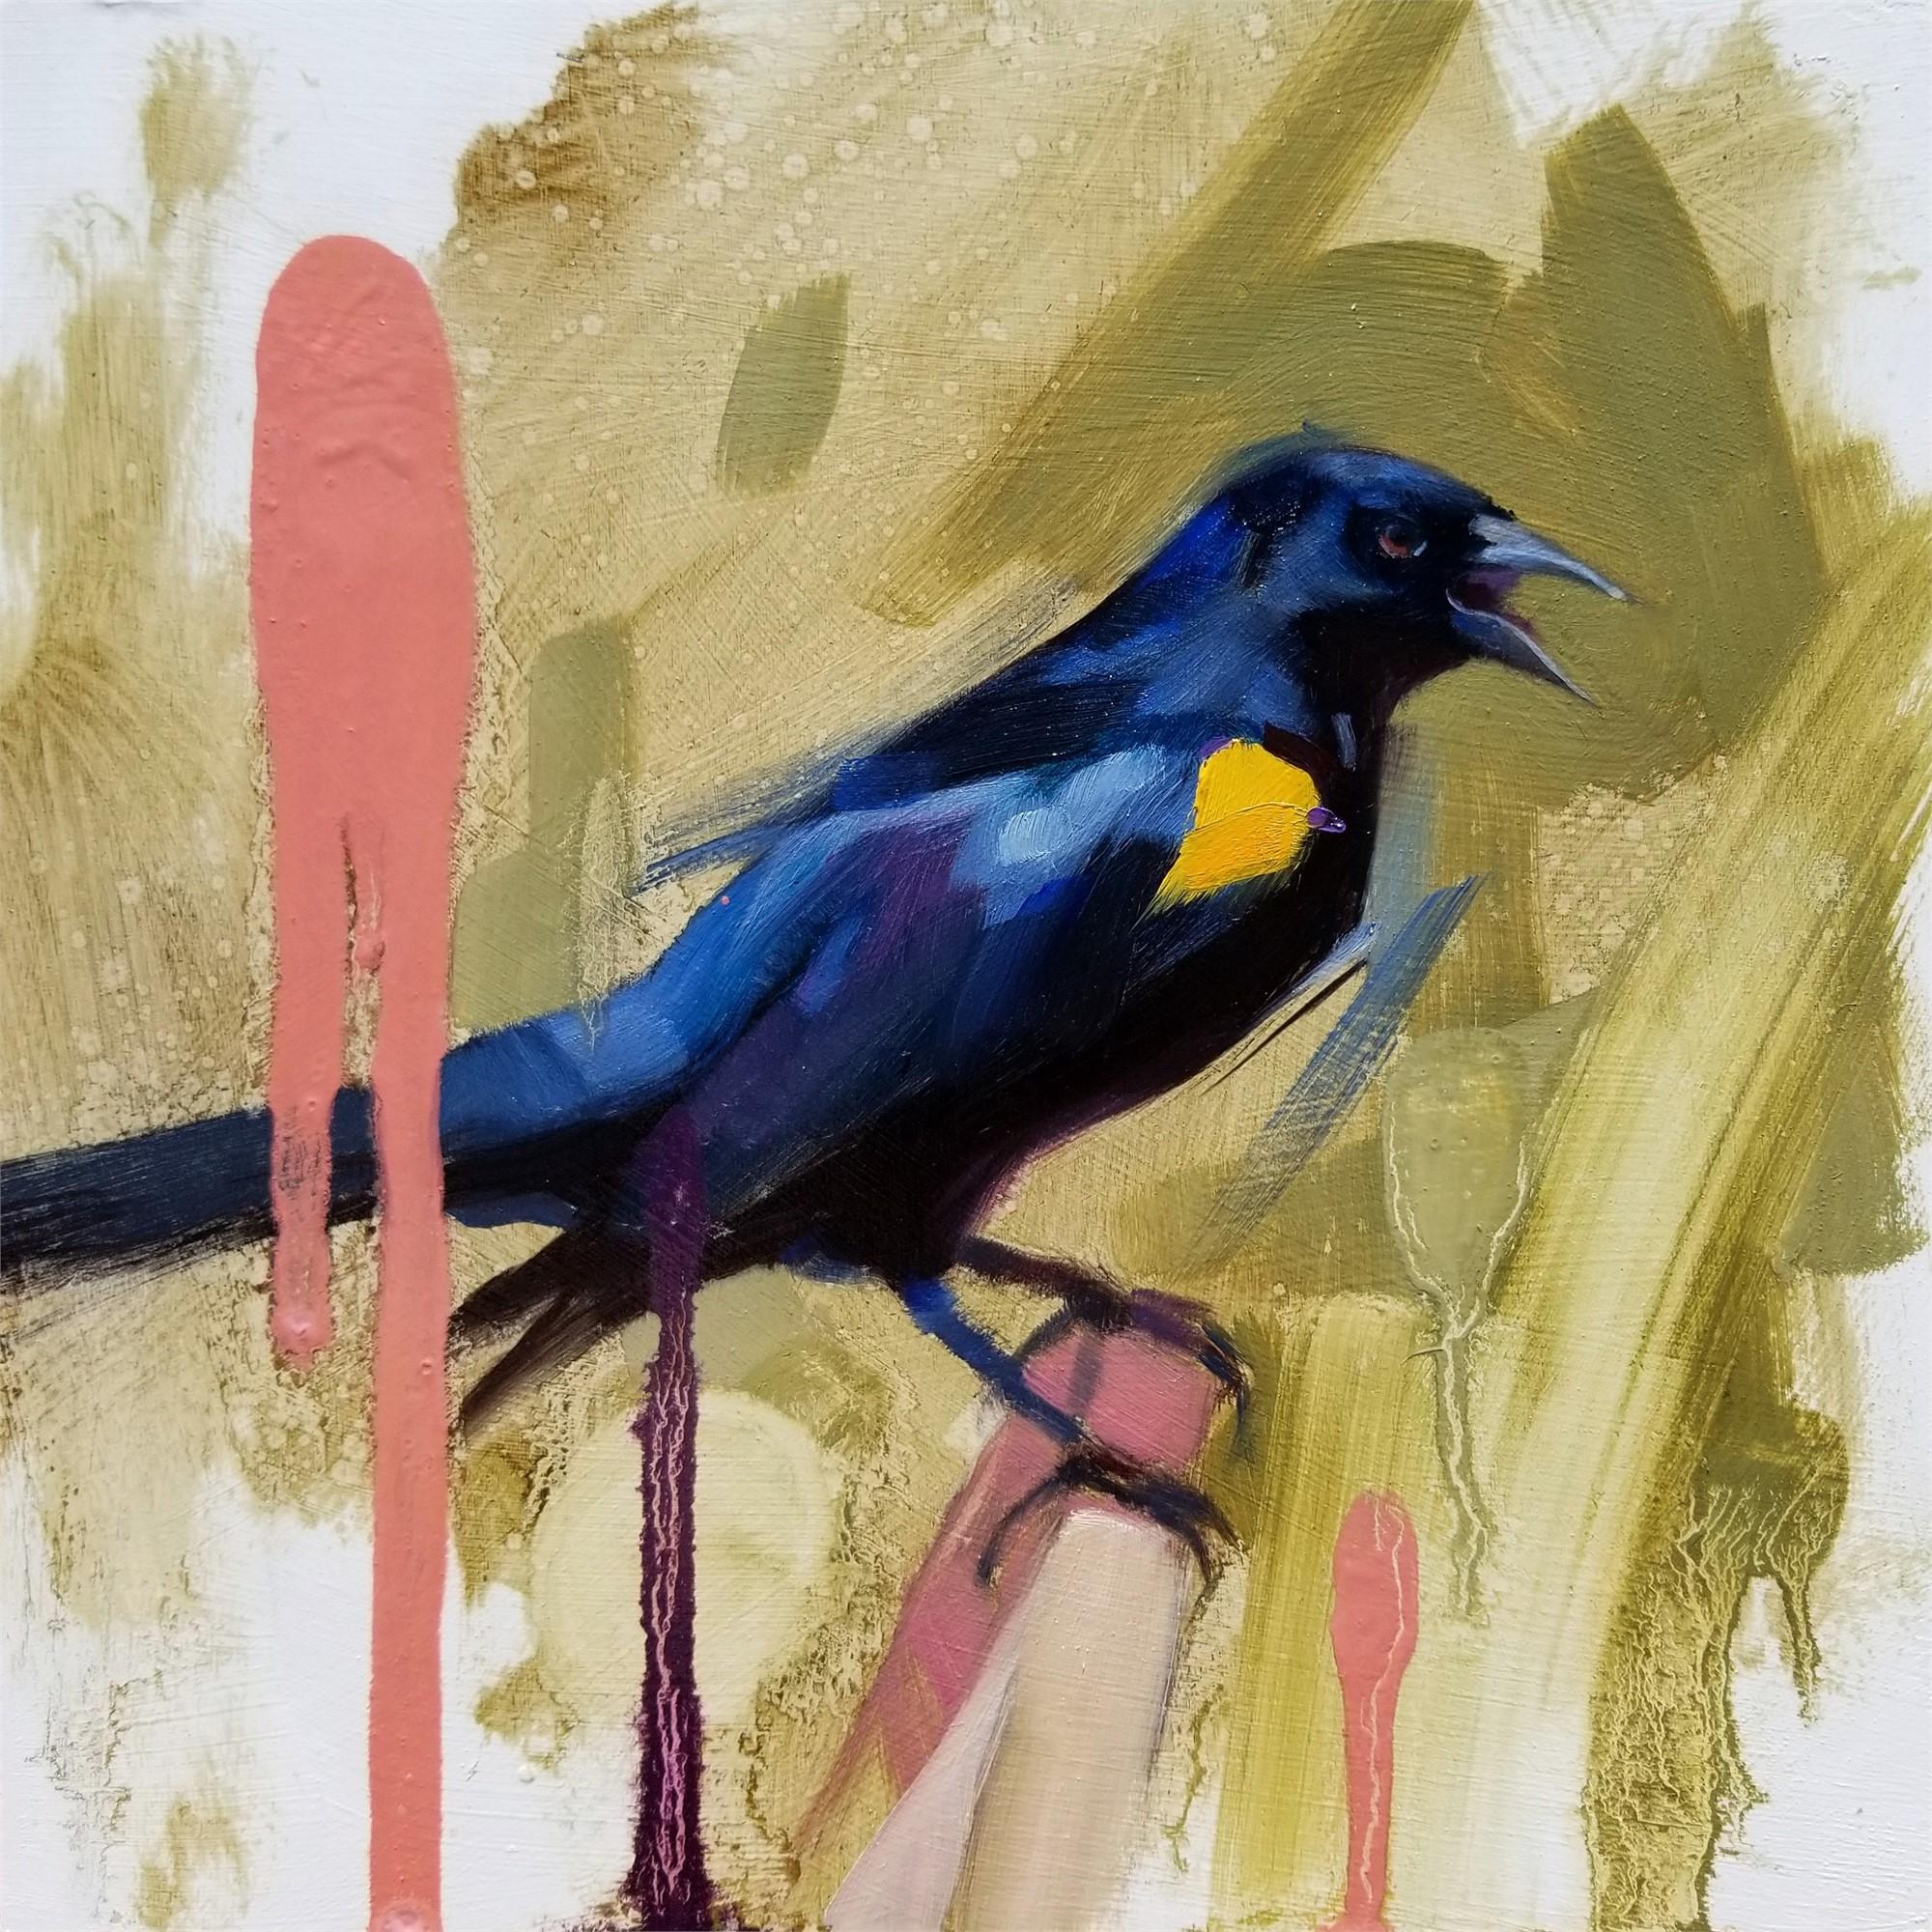 YS Blackbird by Ryan Morse